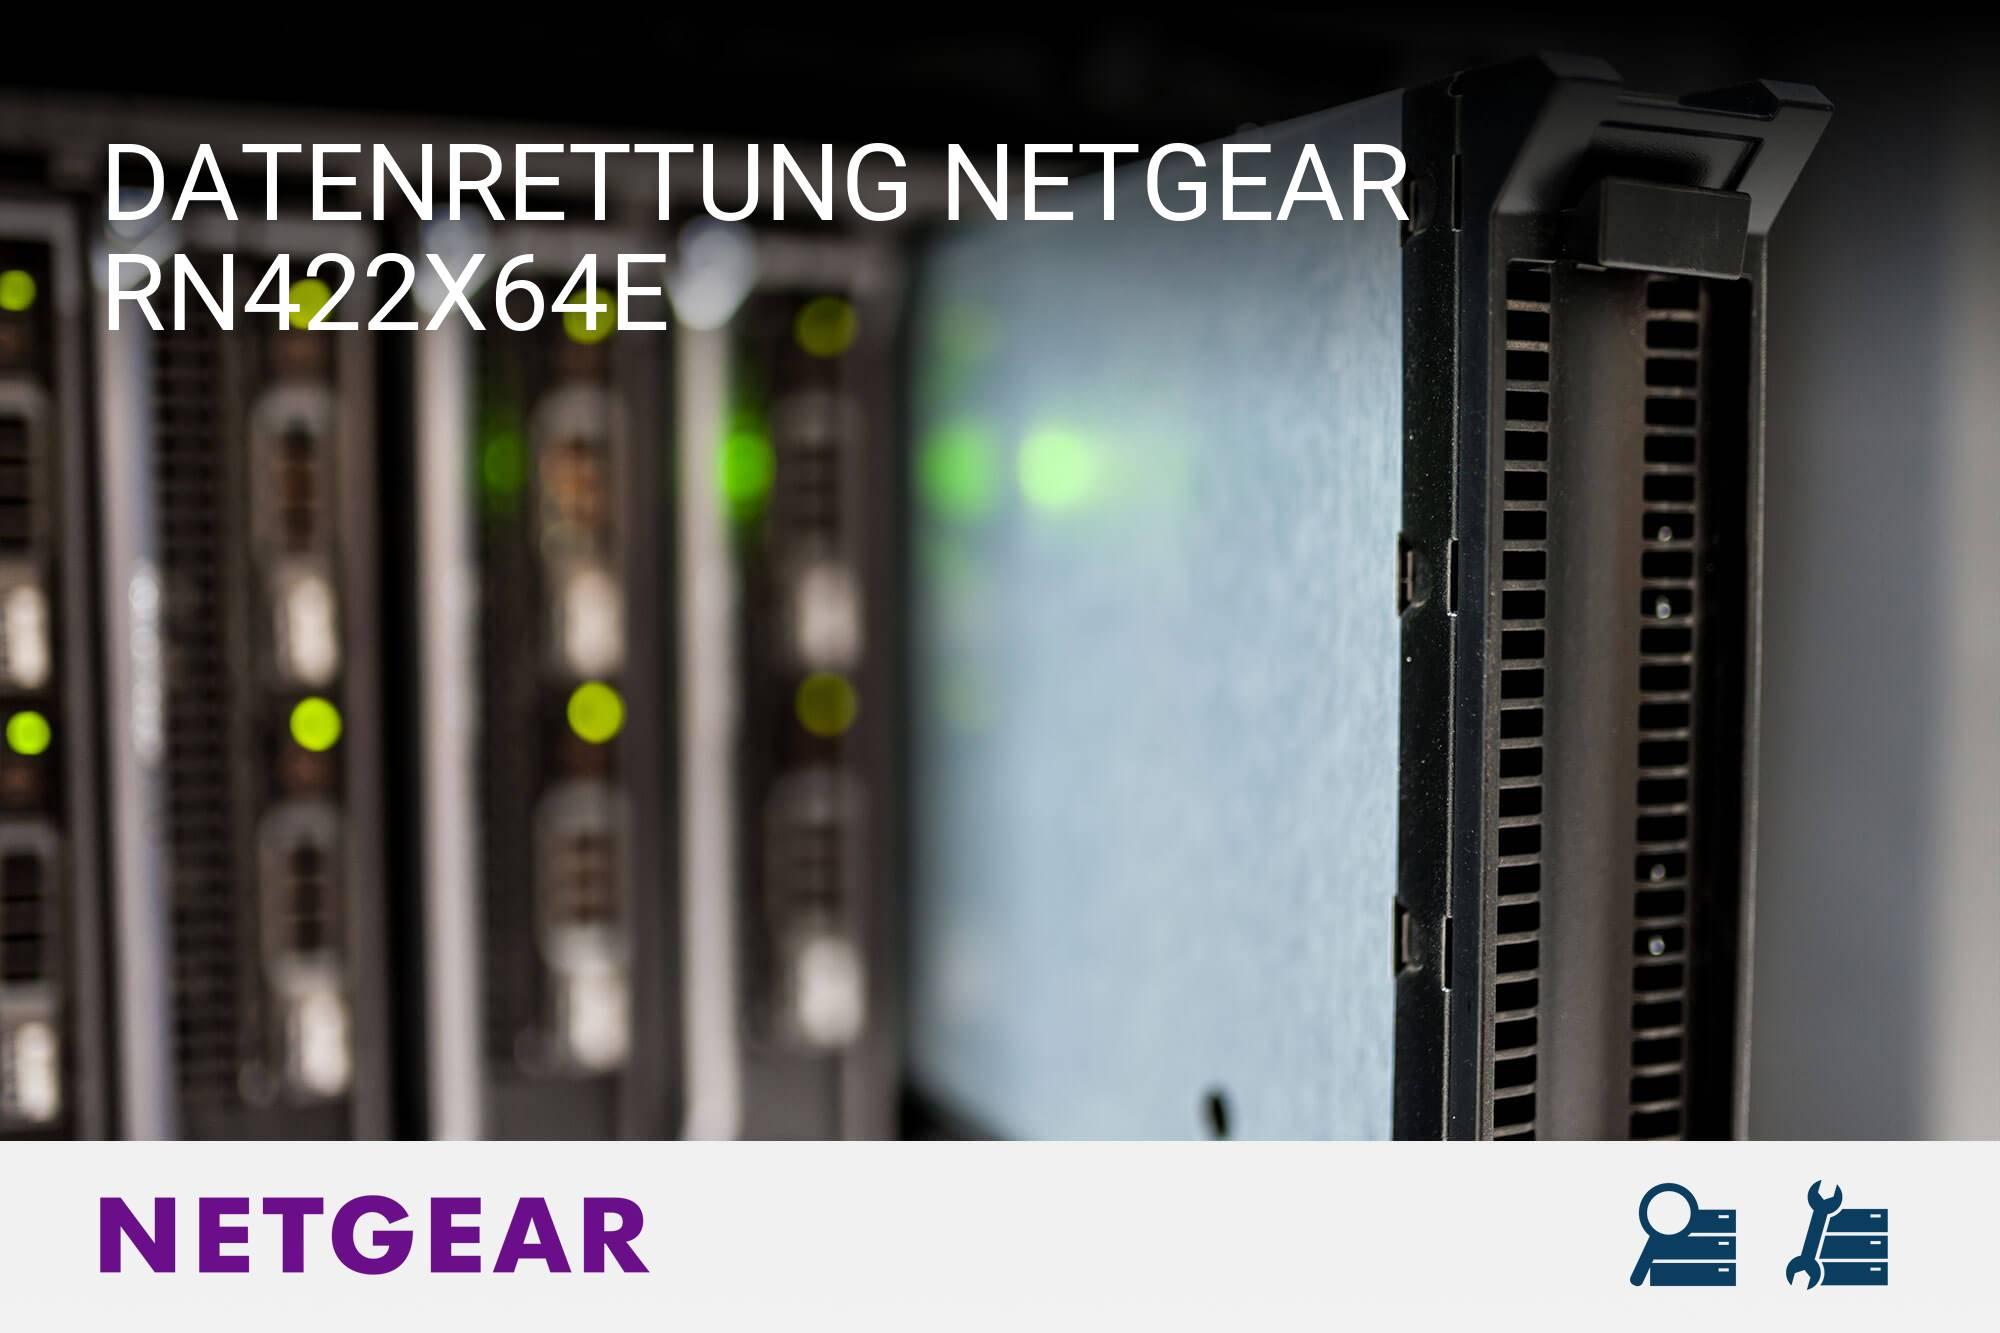 Netgear RN422X64E